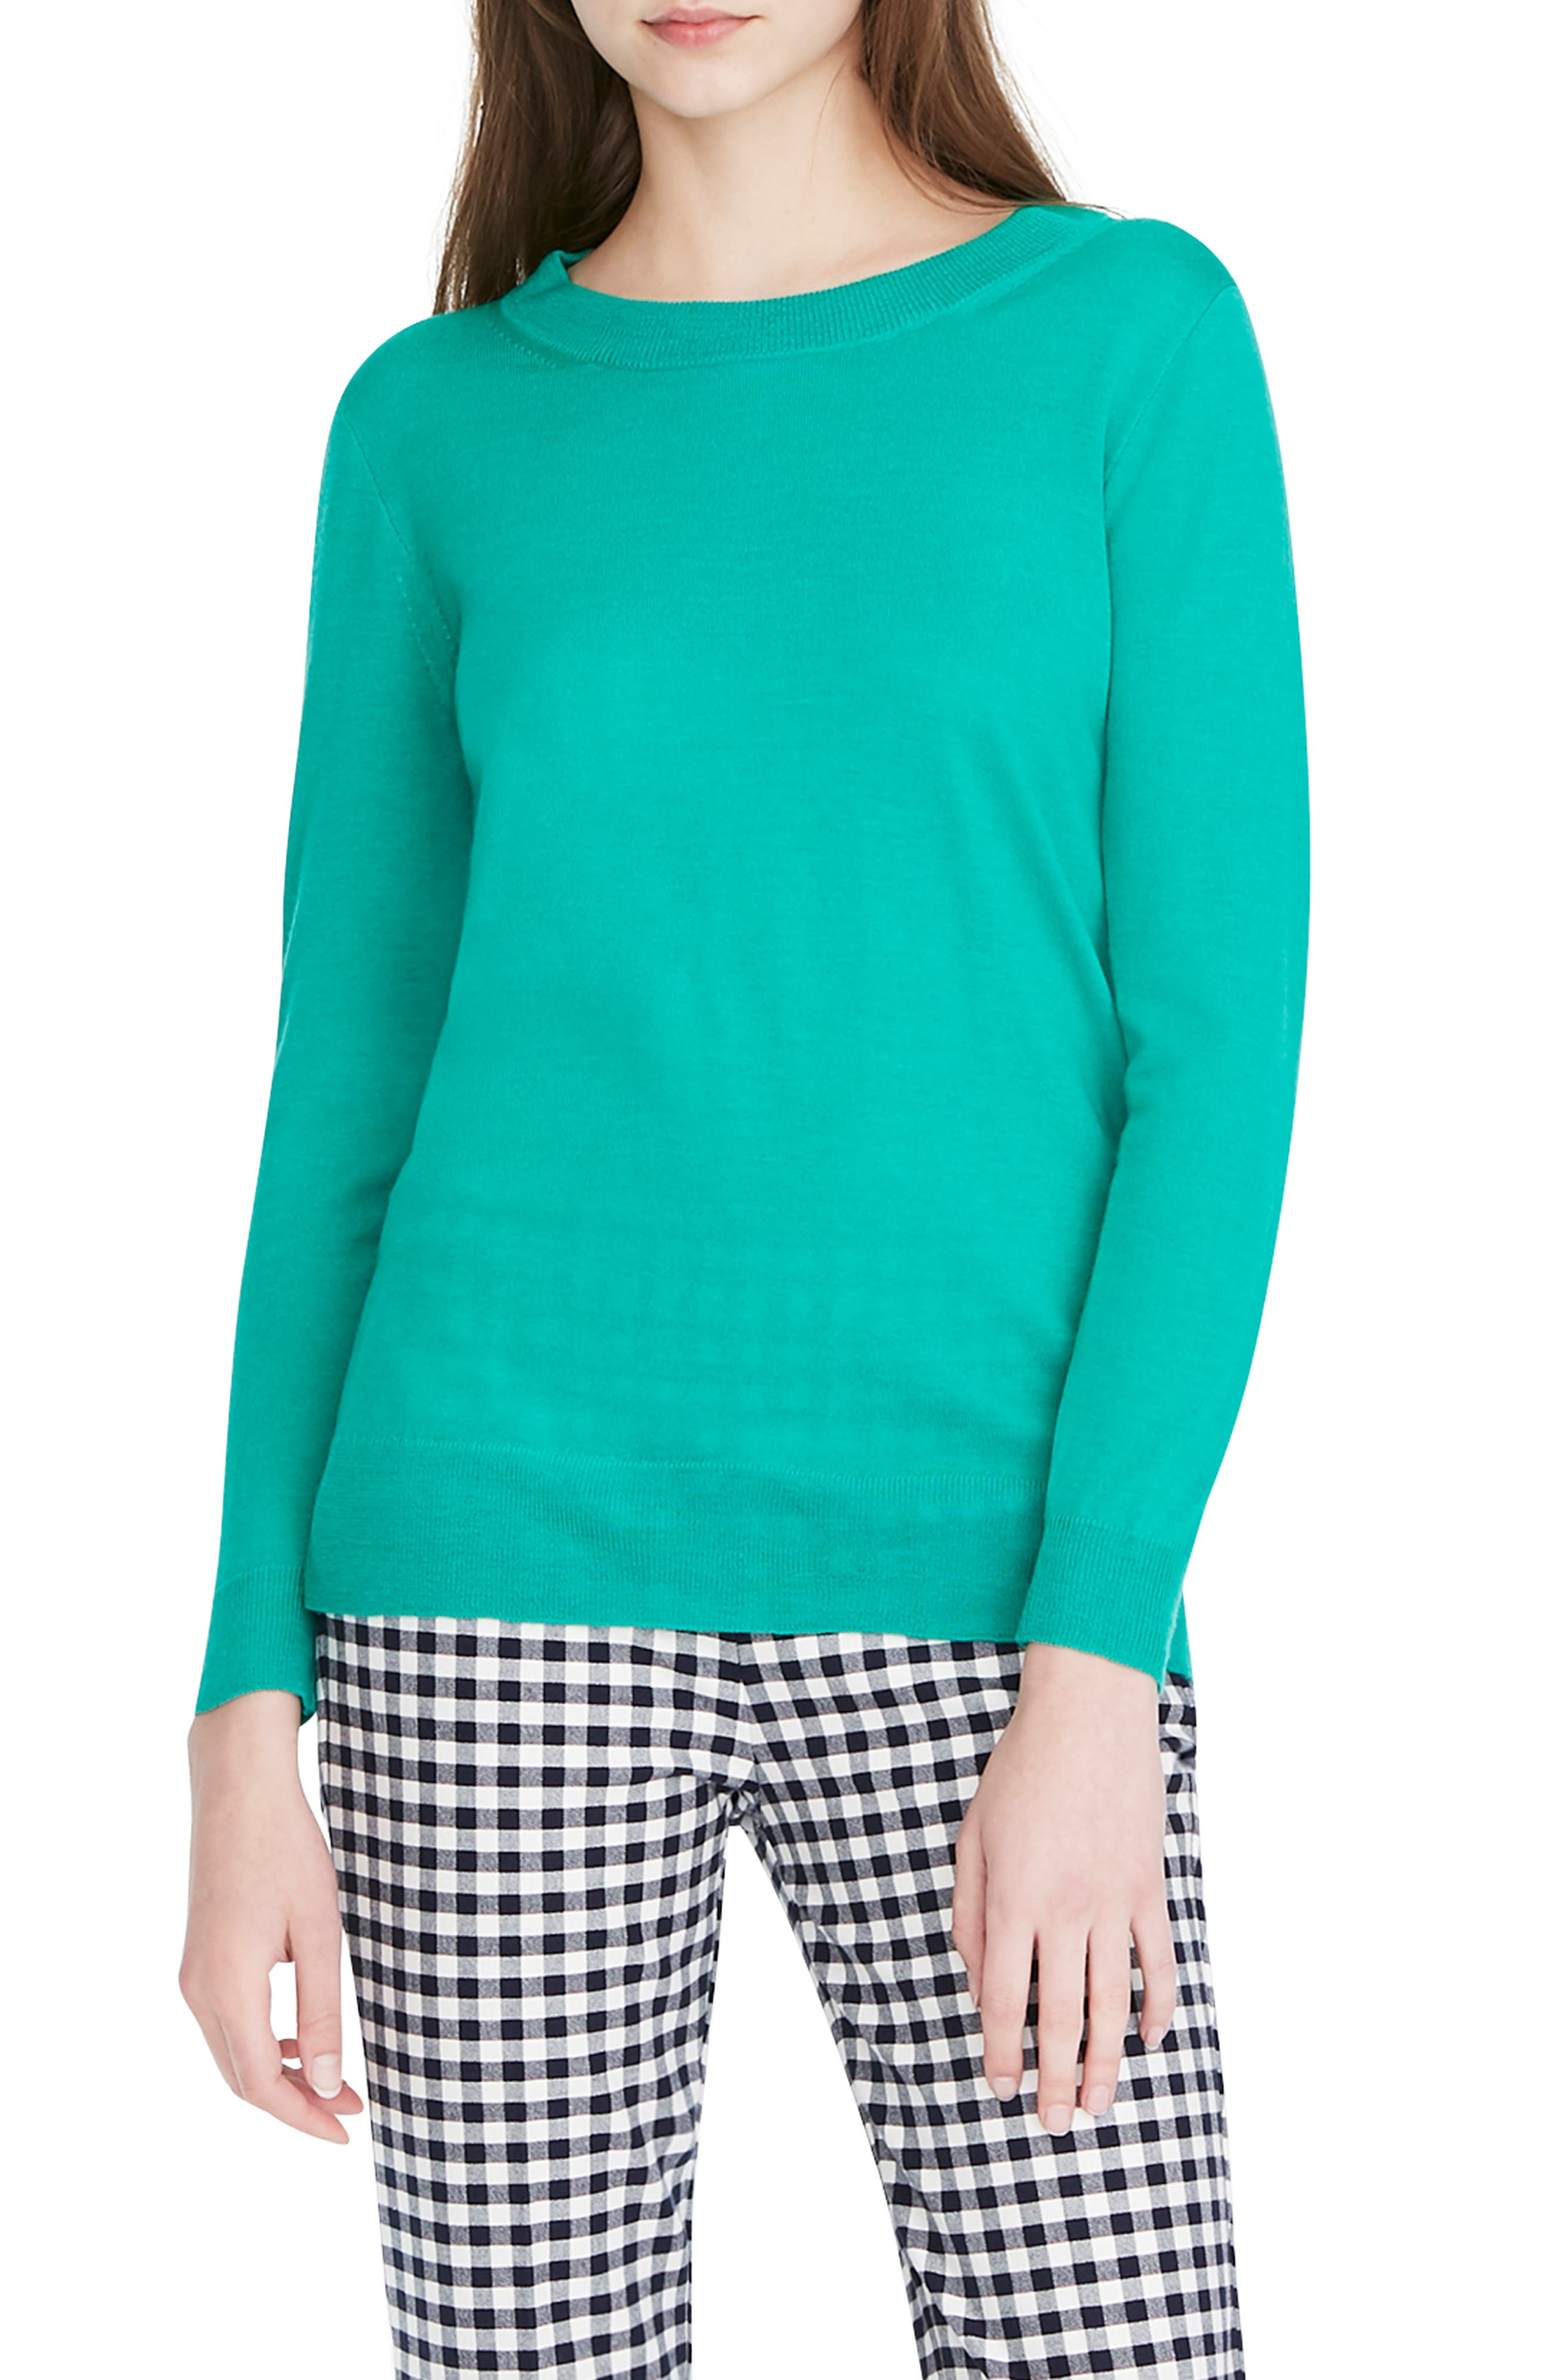 J.crew Tippi Merino Wool Sweater, Green